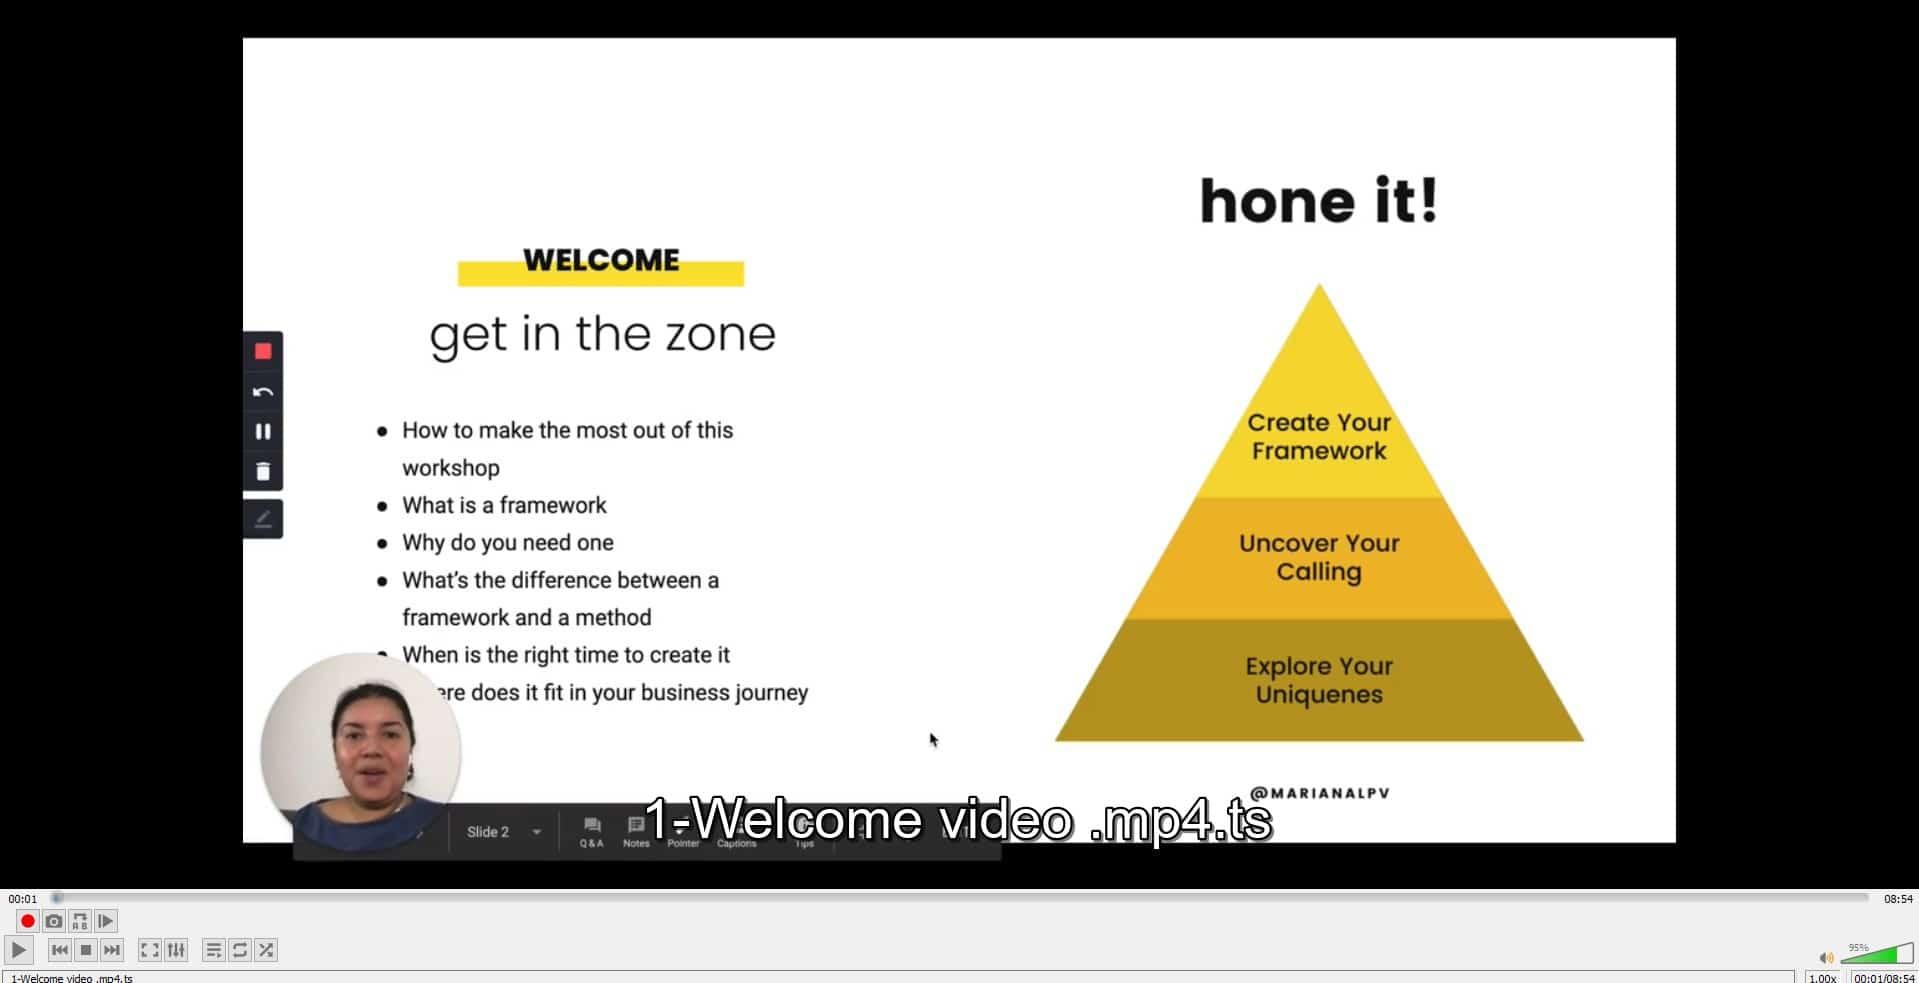 Create your framework by Mariana Peña Offer